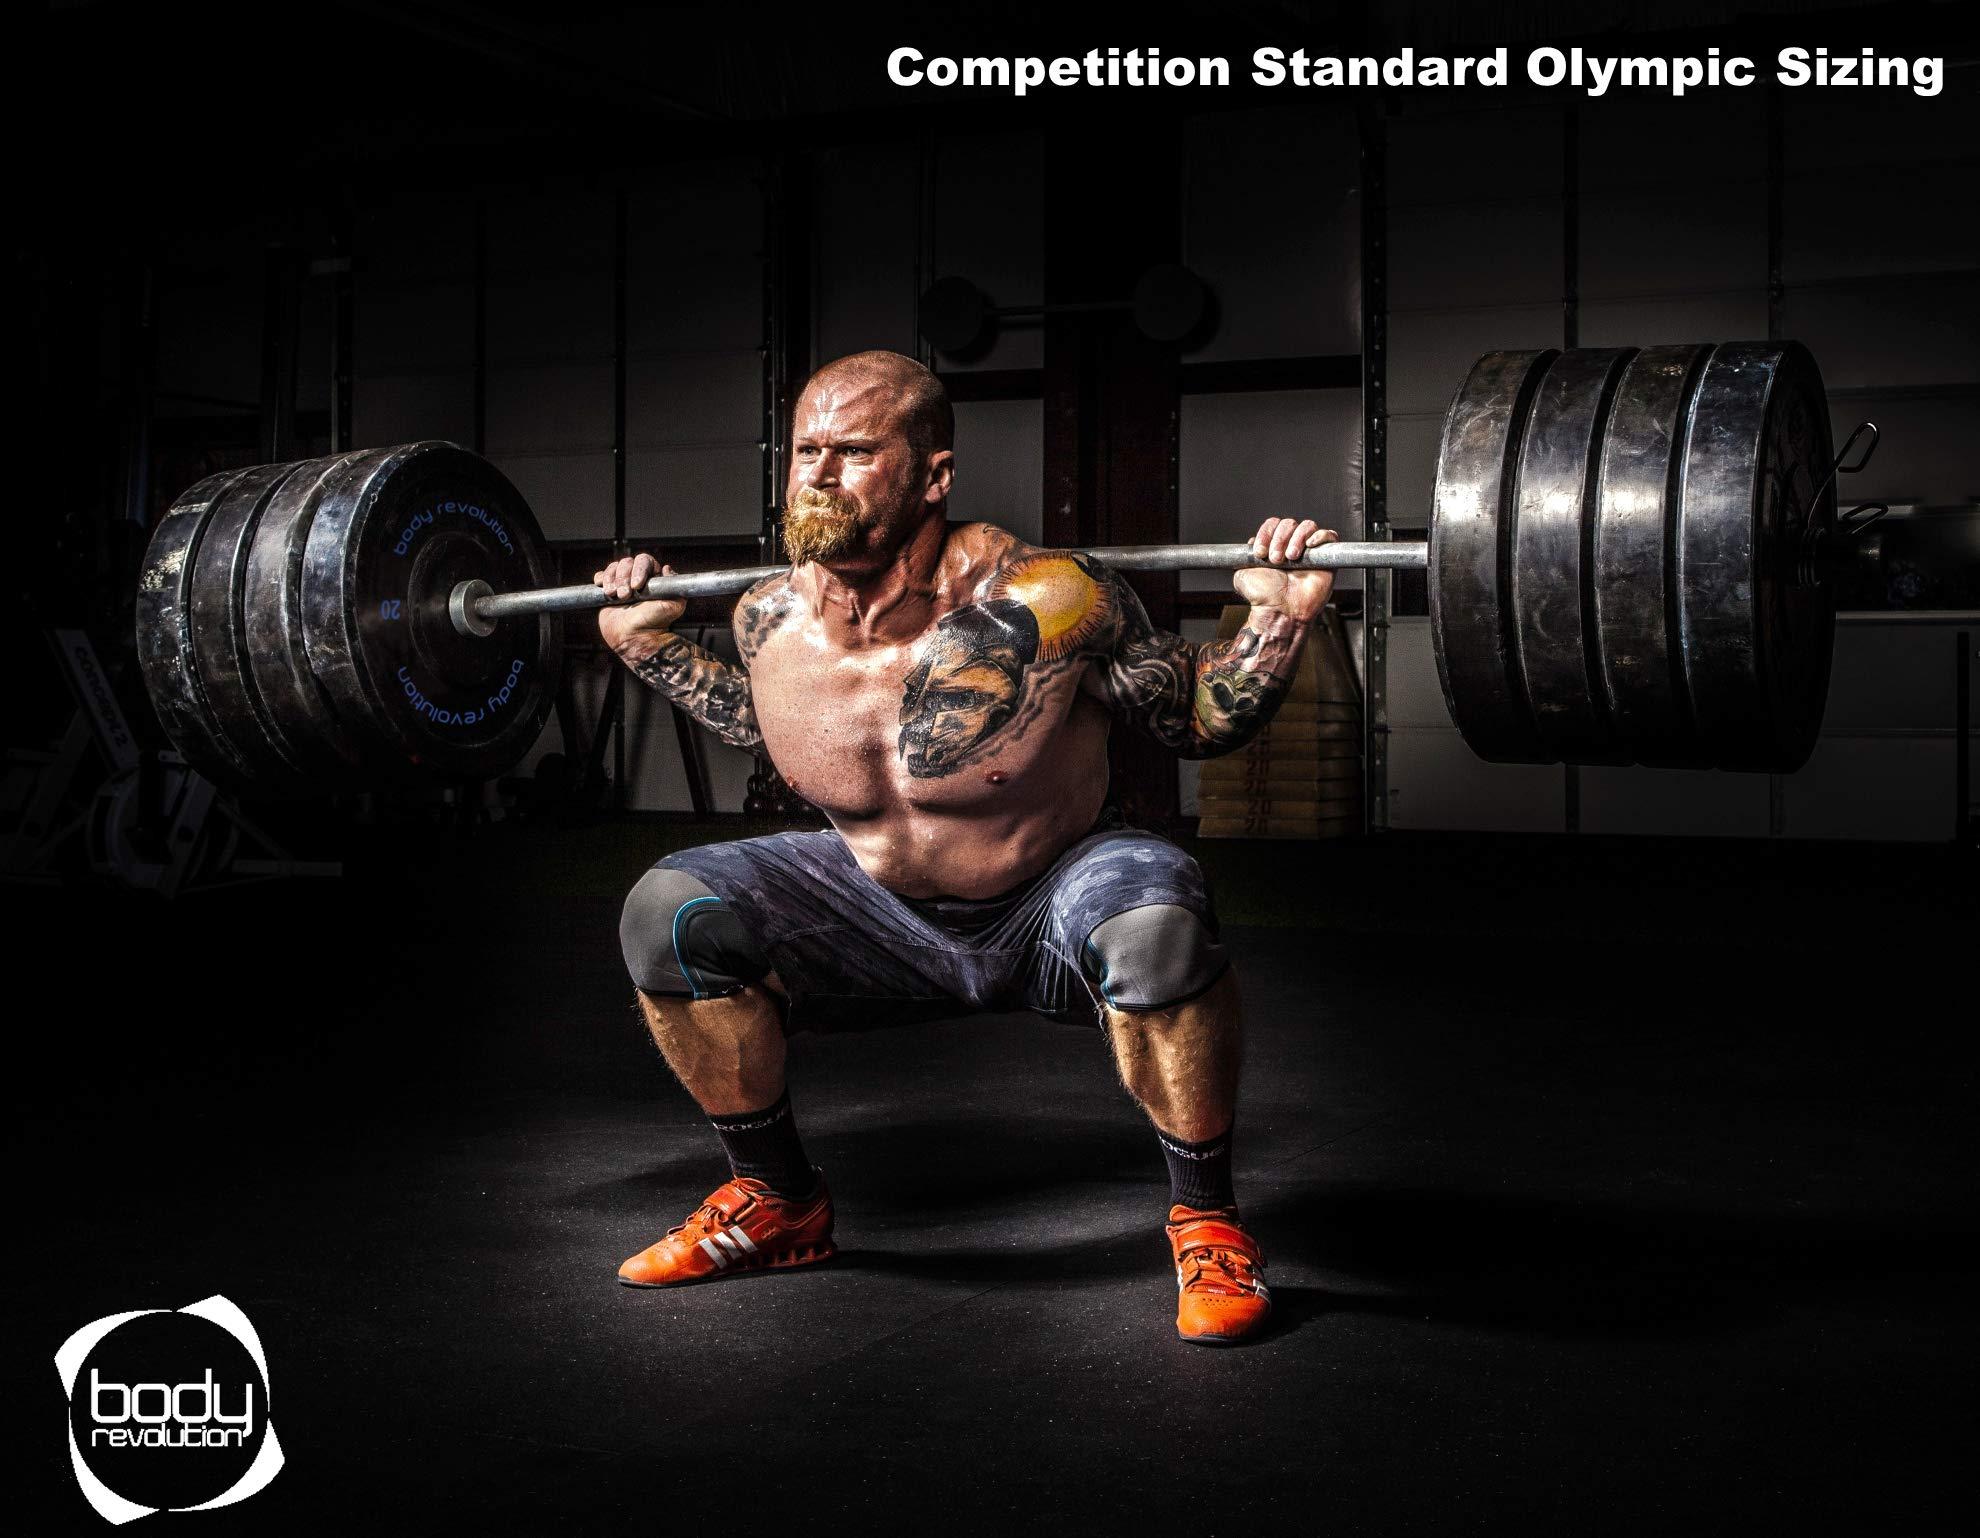 Body Revolution Goma Parachoques Placas Levantamiento Pesas Olímpico 2